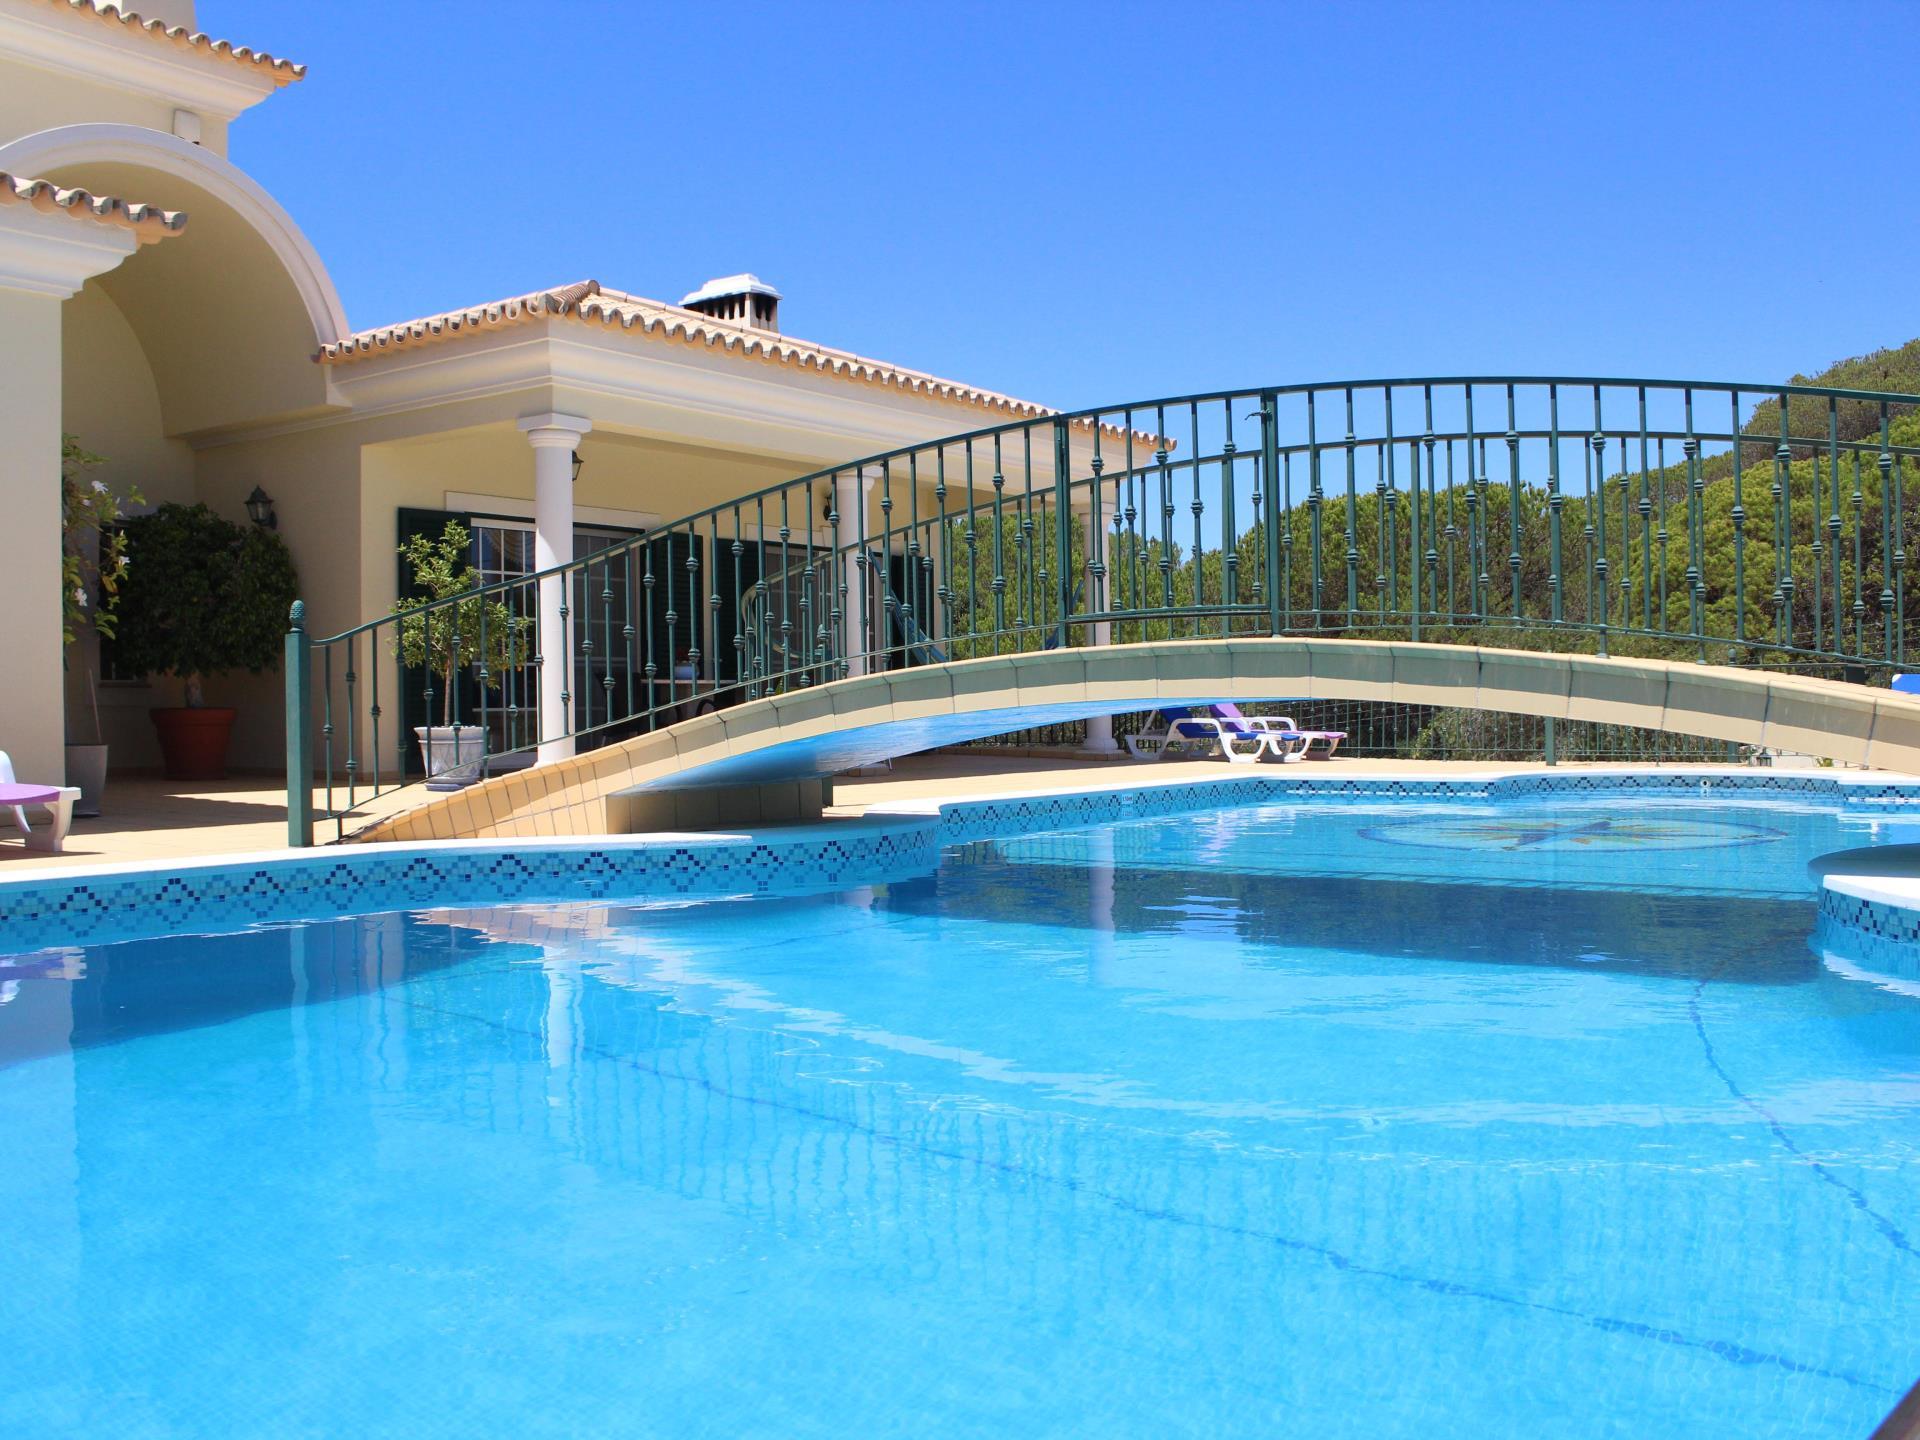 Casa para uma família para Venda às Detached house, 8 bedrooms, for Sale Loule, Algarve Portugal